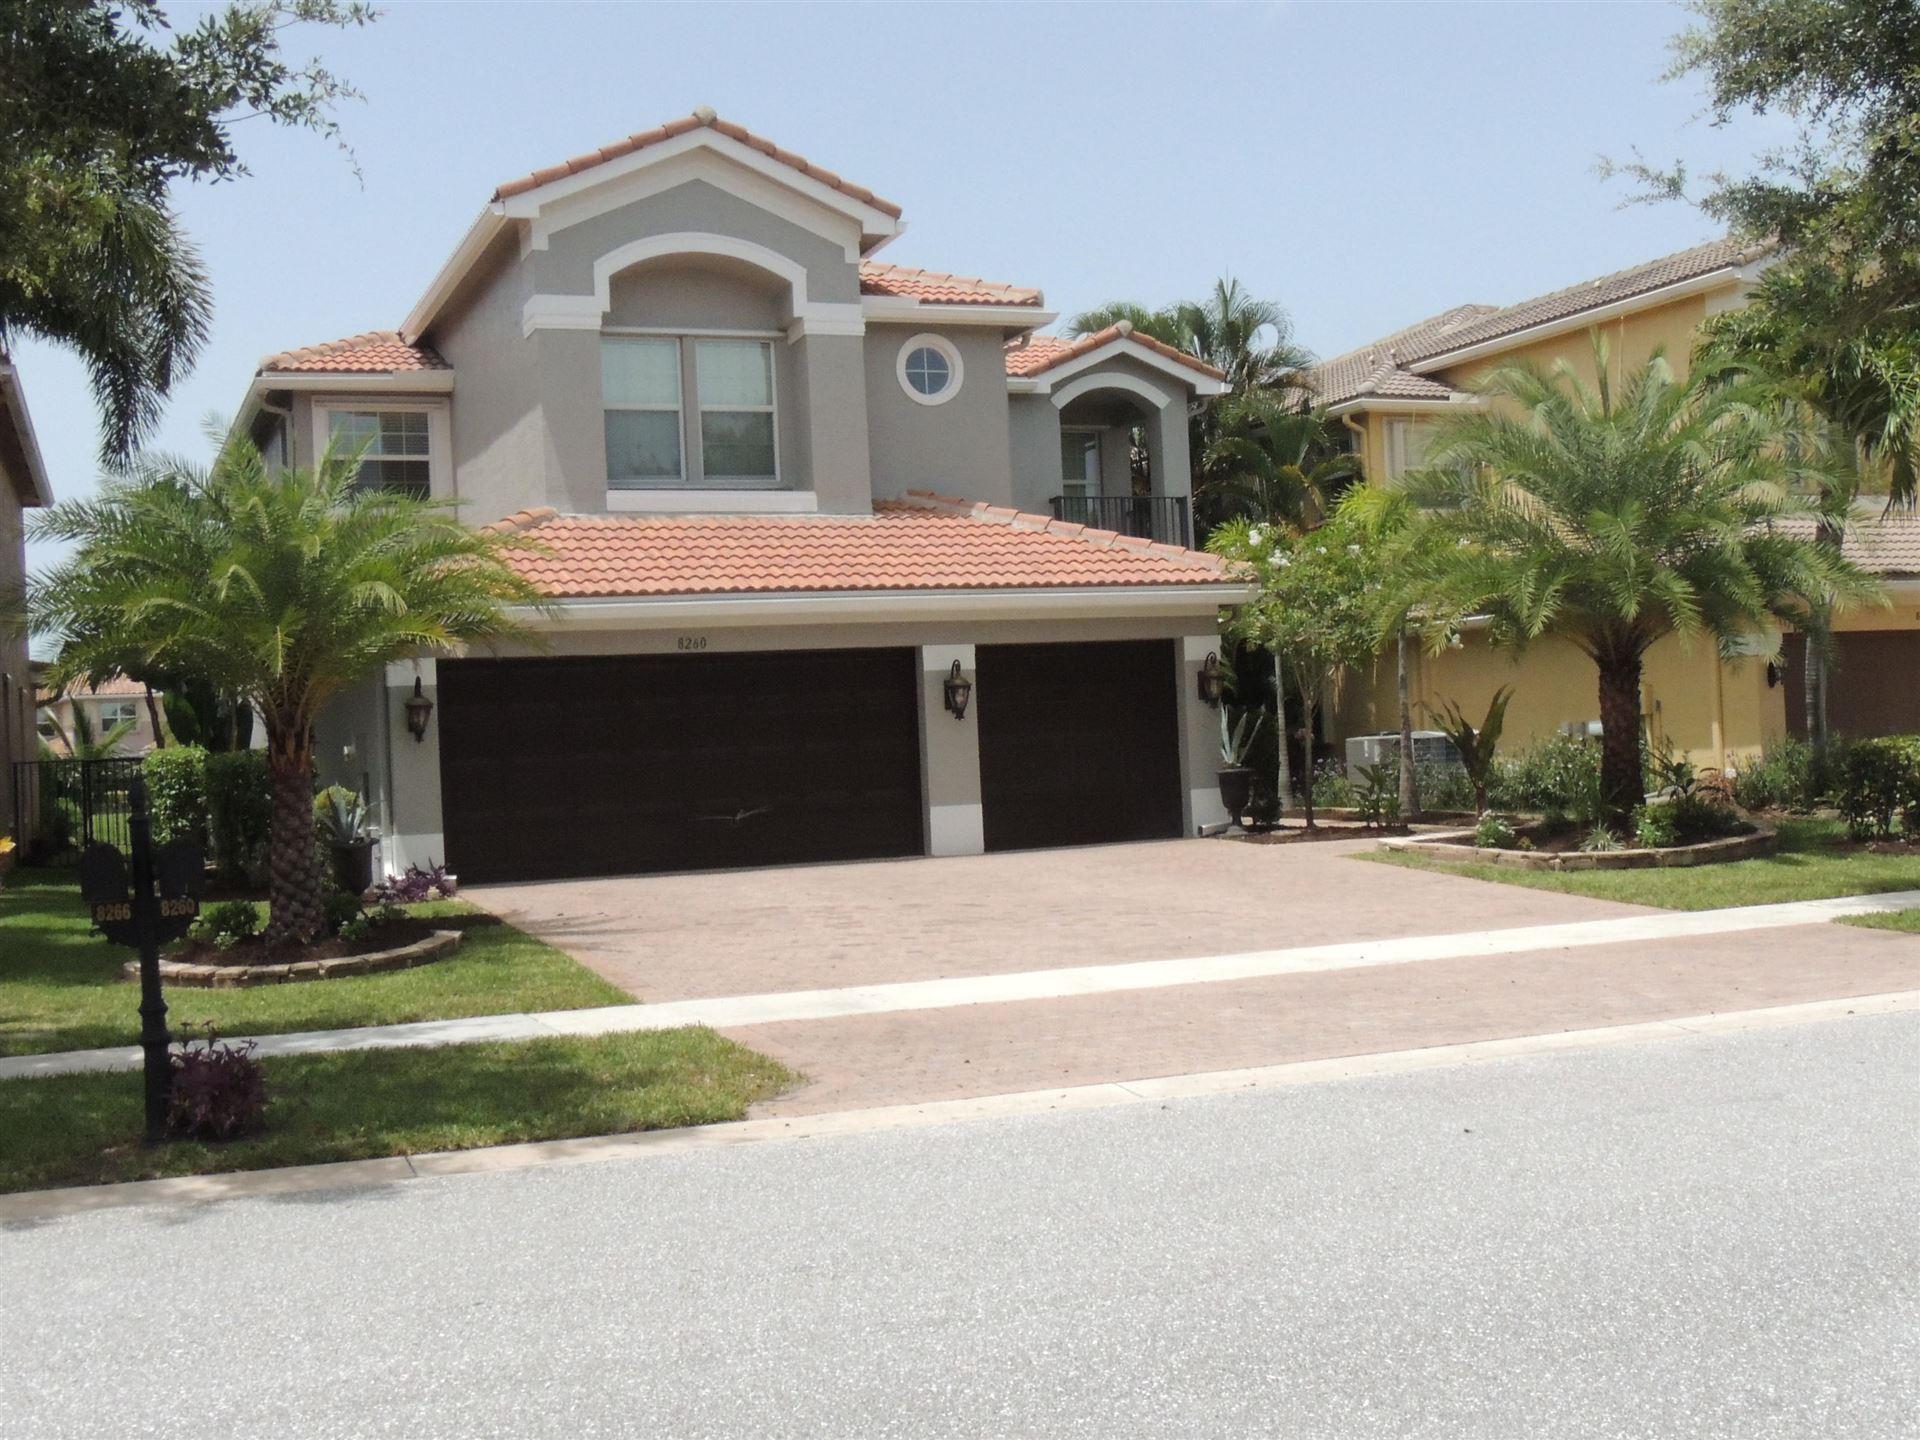 Photo of 8260 Emerald Winds Circle, Boynton Beach, FL 33473 (MLS # RX-10642179)